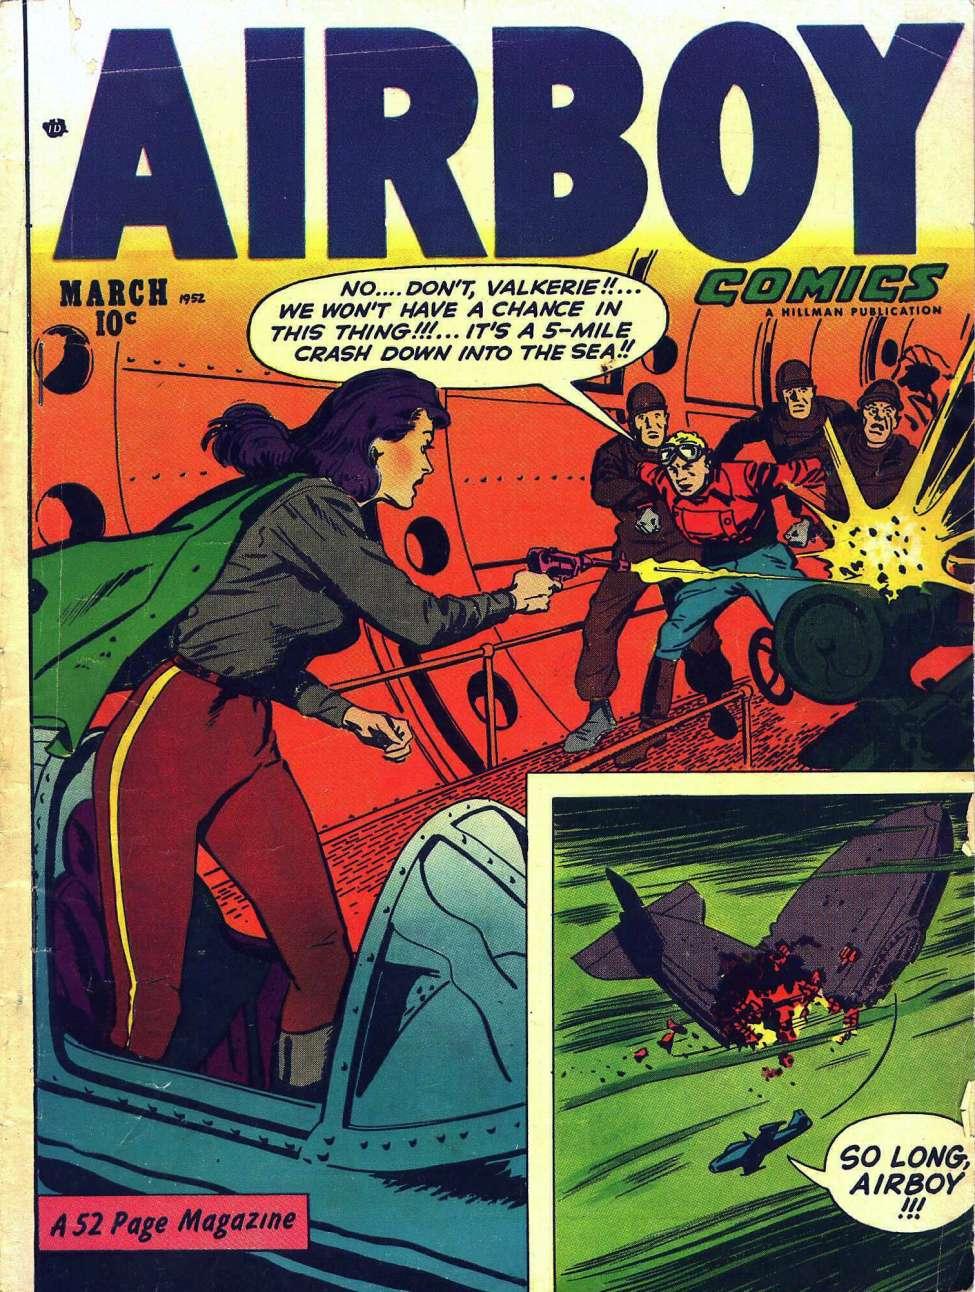 AirboyValkeryre